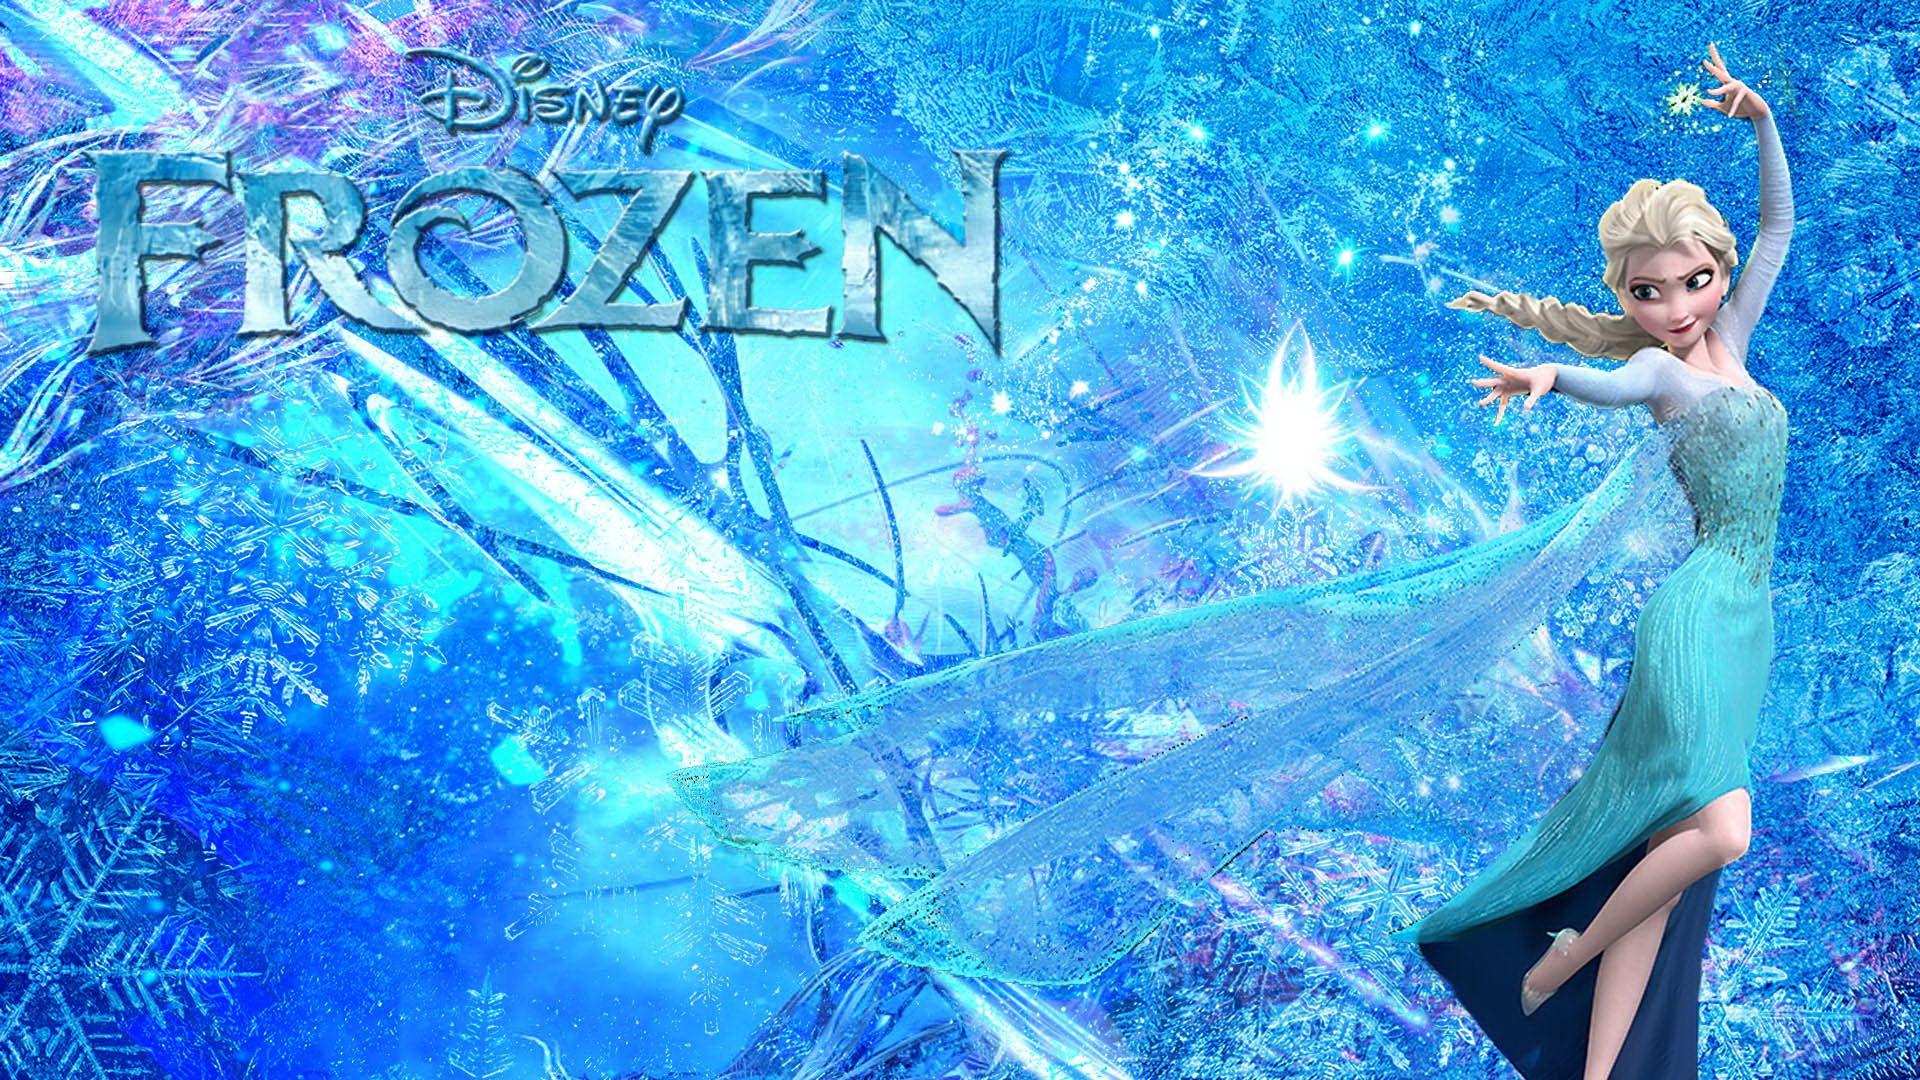 Frozen Wallpaper Tablet Wallpaper Walt disney, Disney